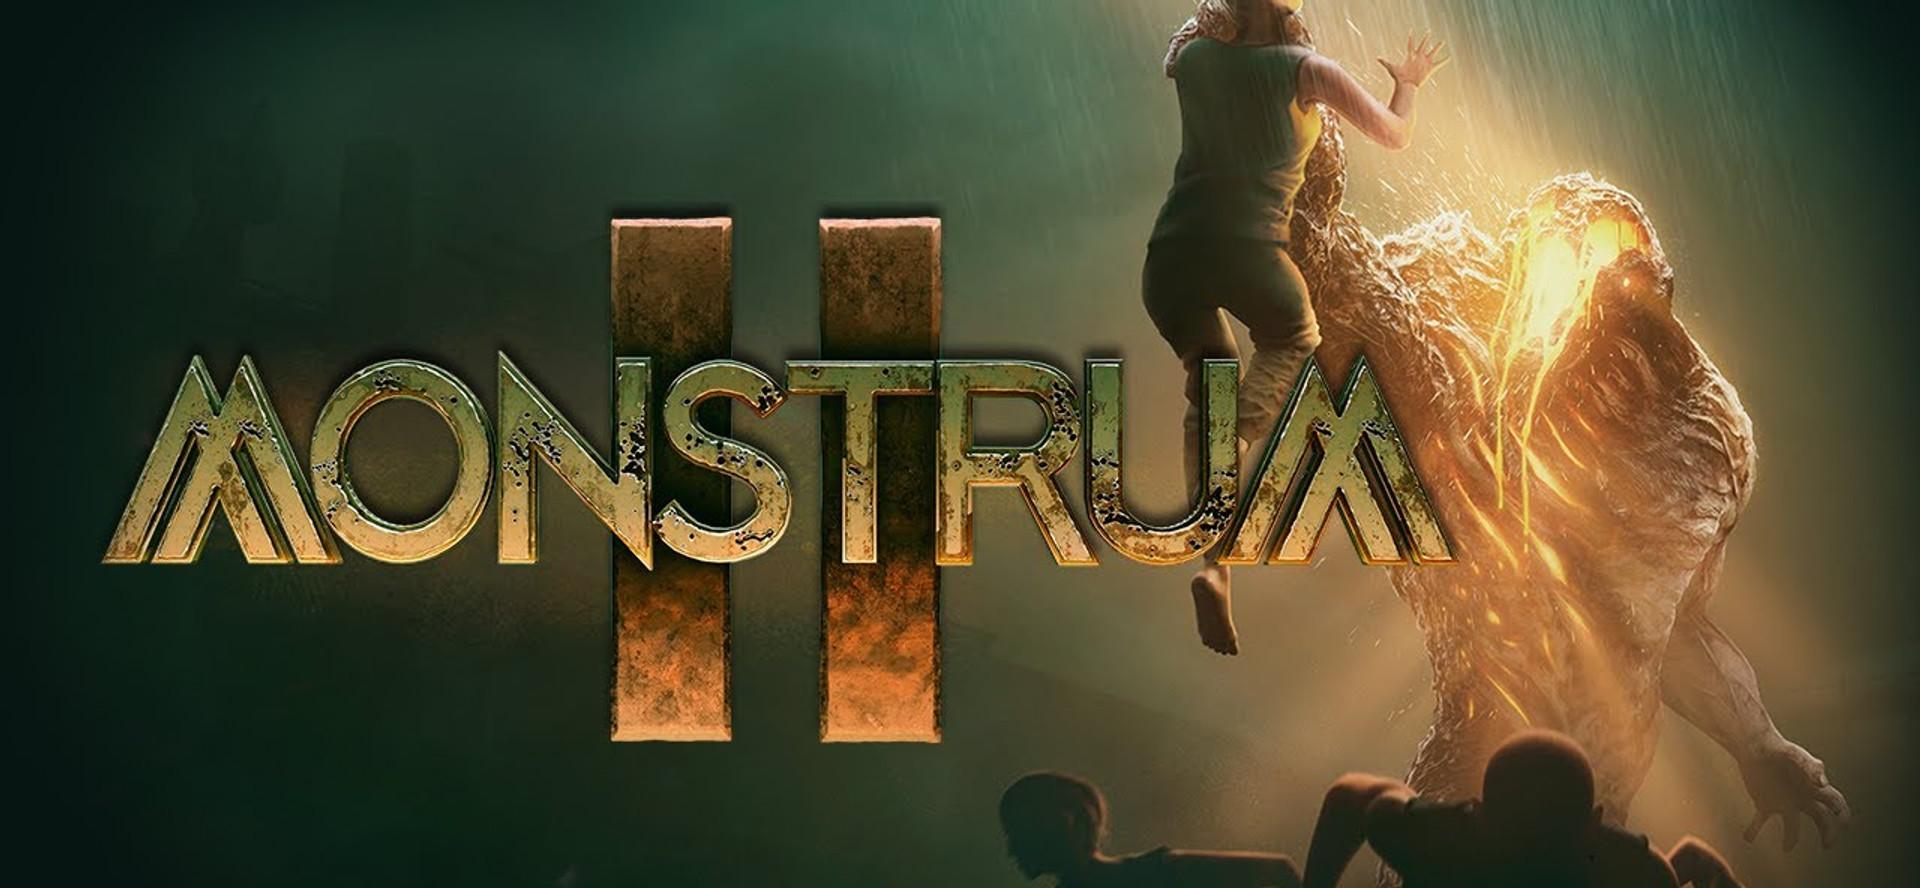 Monstrum 2 Official Cinematic Trailer